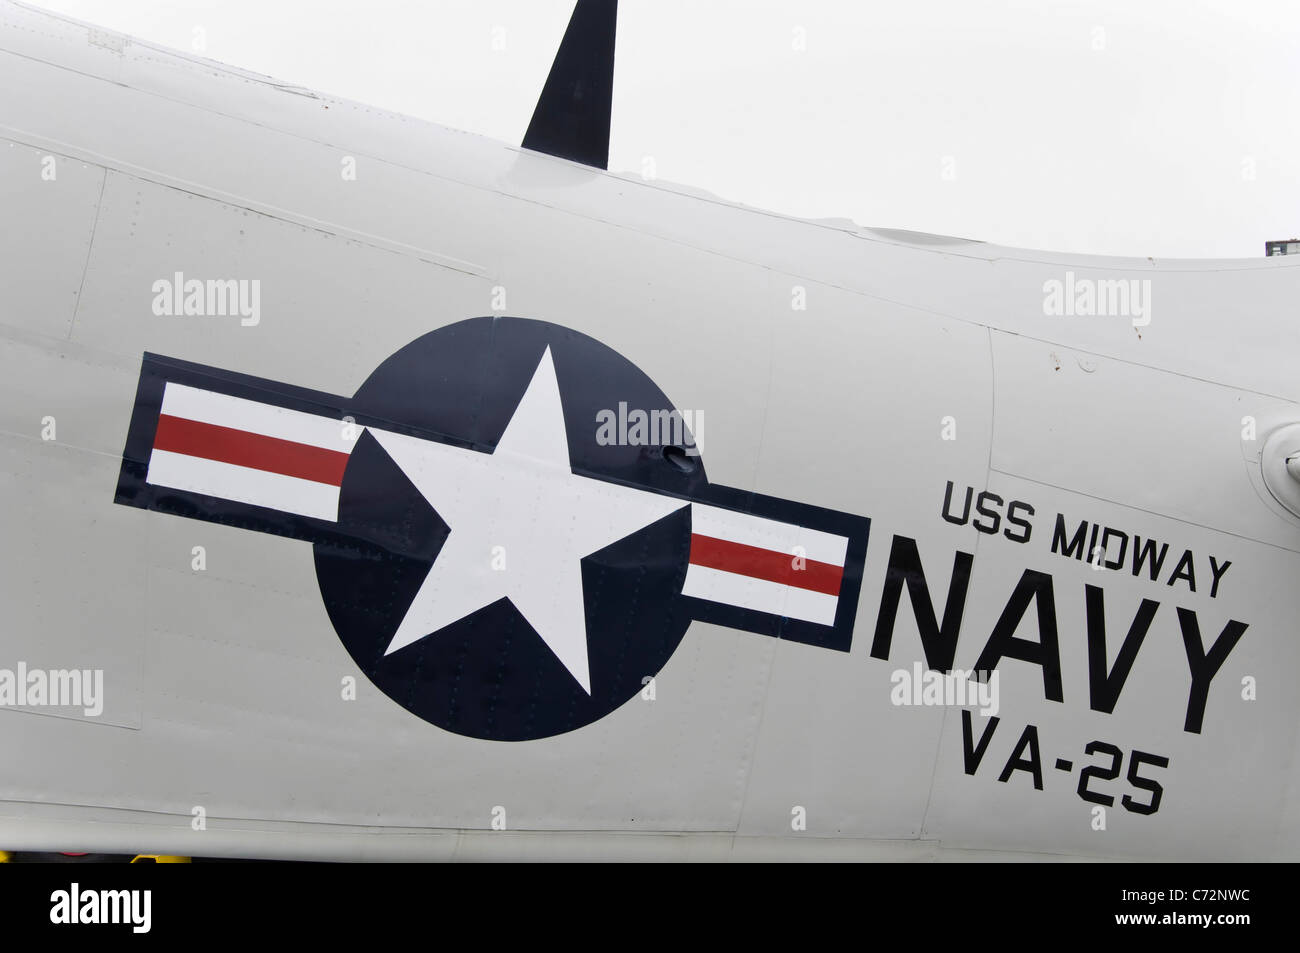 US Navy logo Stock Photo: 38784408 - Alamy